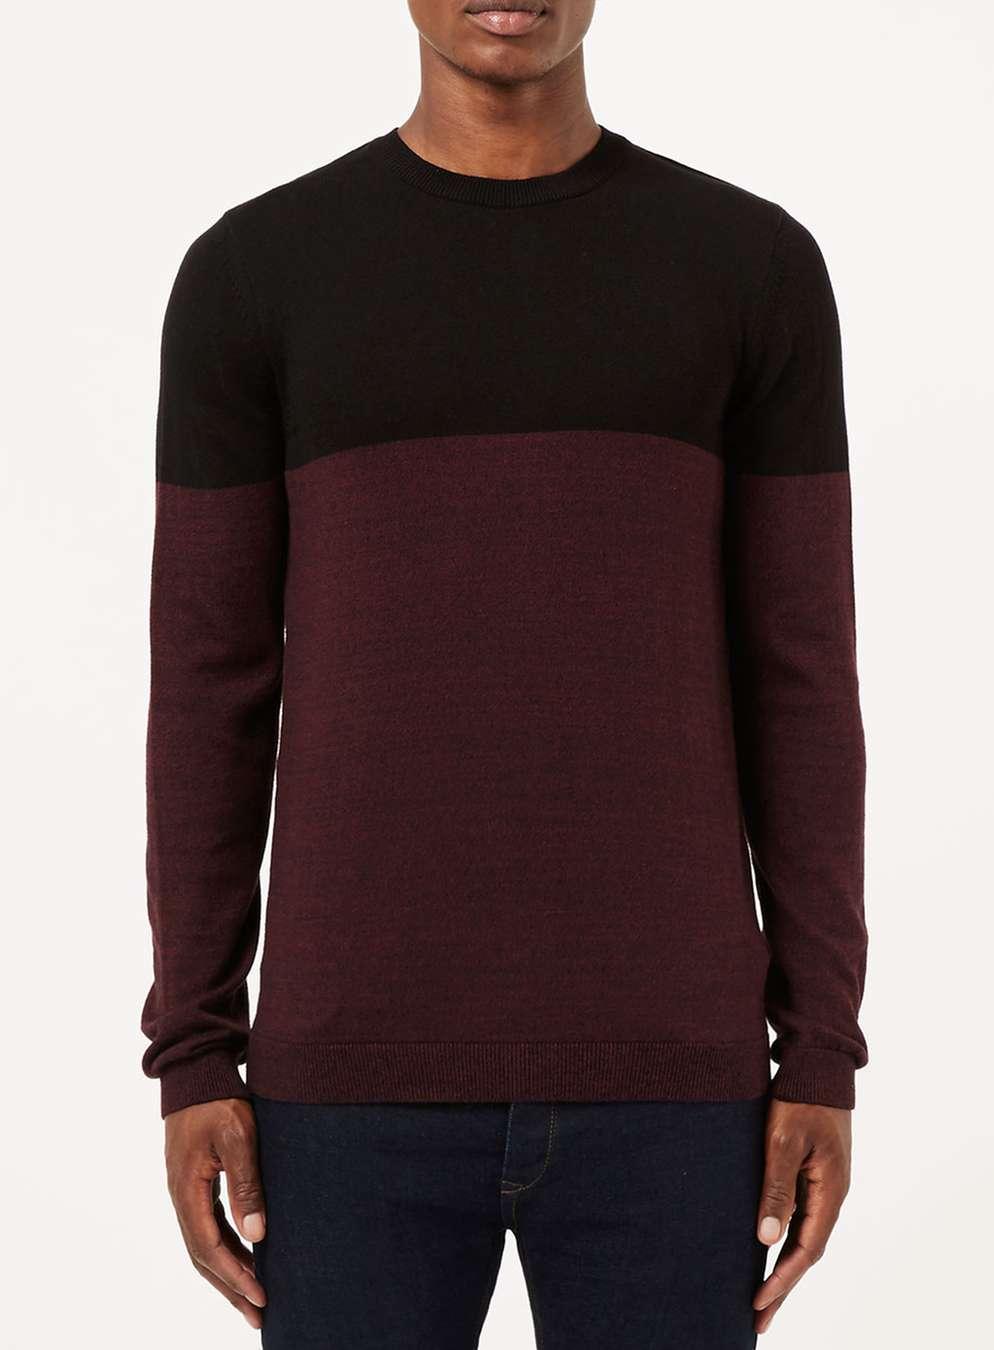 Topman Black And Burgundy Colour Block Jumper